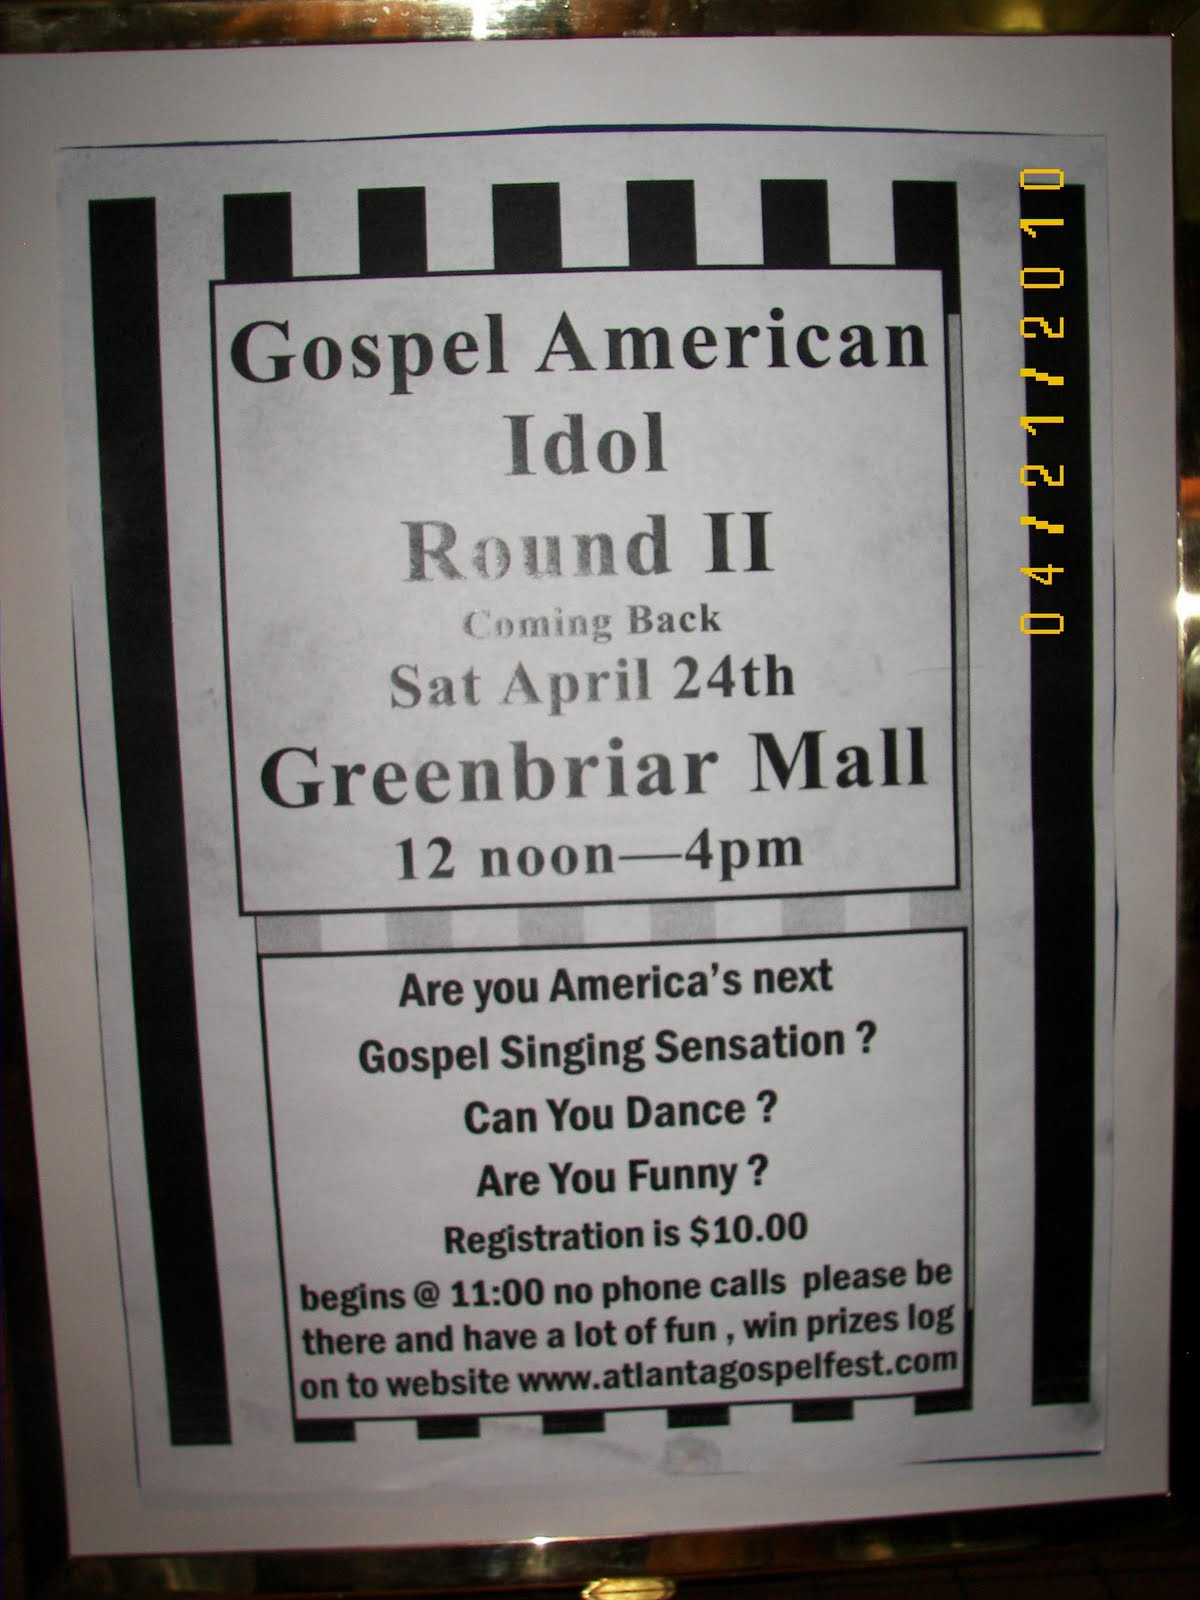 http://1.bp.blogspot.com/_9KuEP--9wWA/S9C4BMrOJWI/AAAAAAAAL0A/PRvPhwplWME/s1600/gospelamericanidolii.JPG